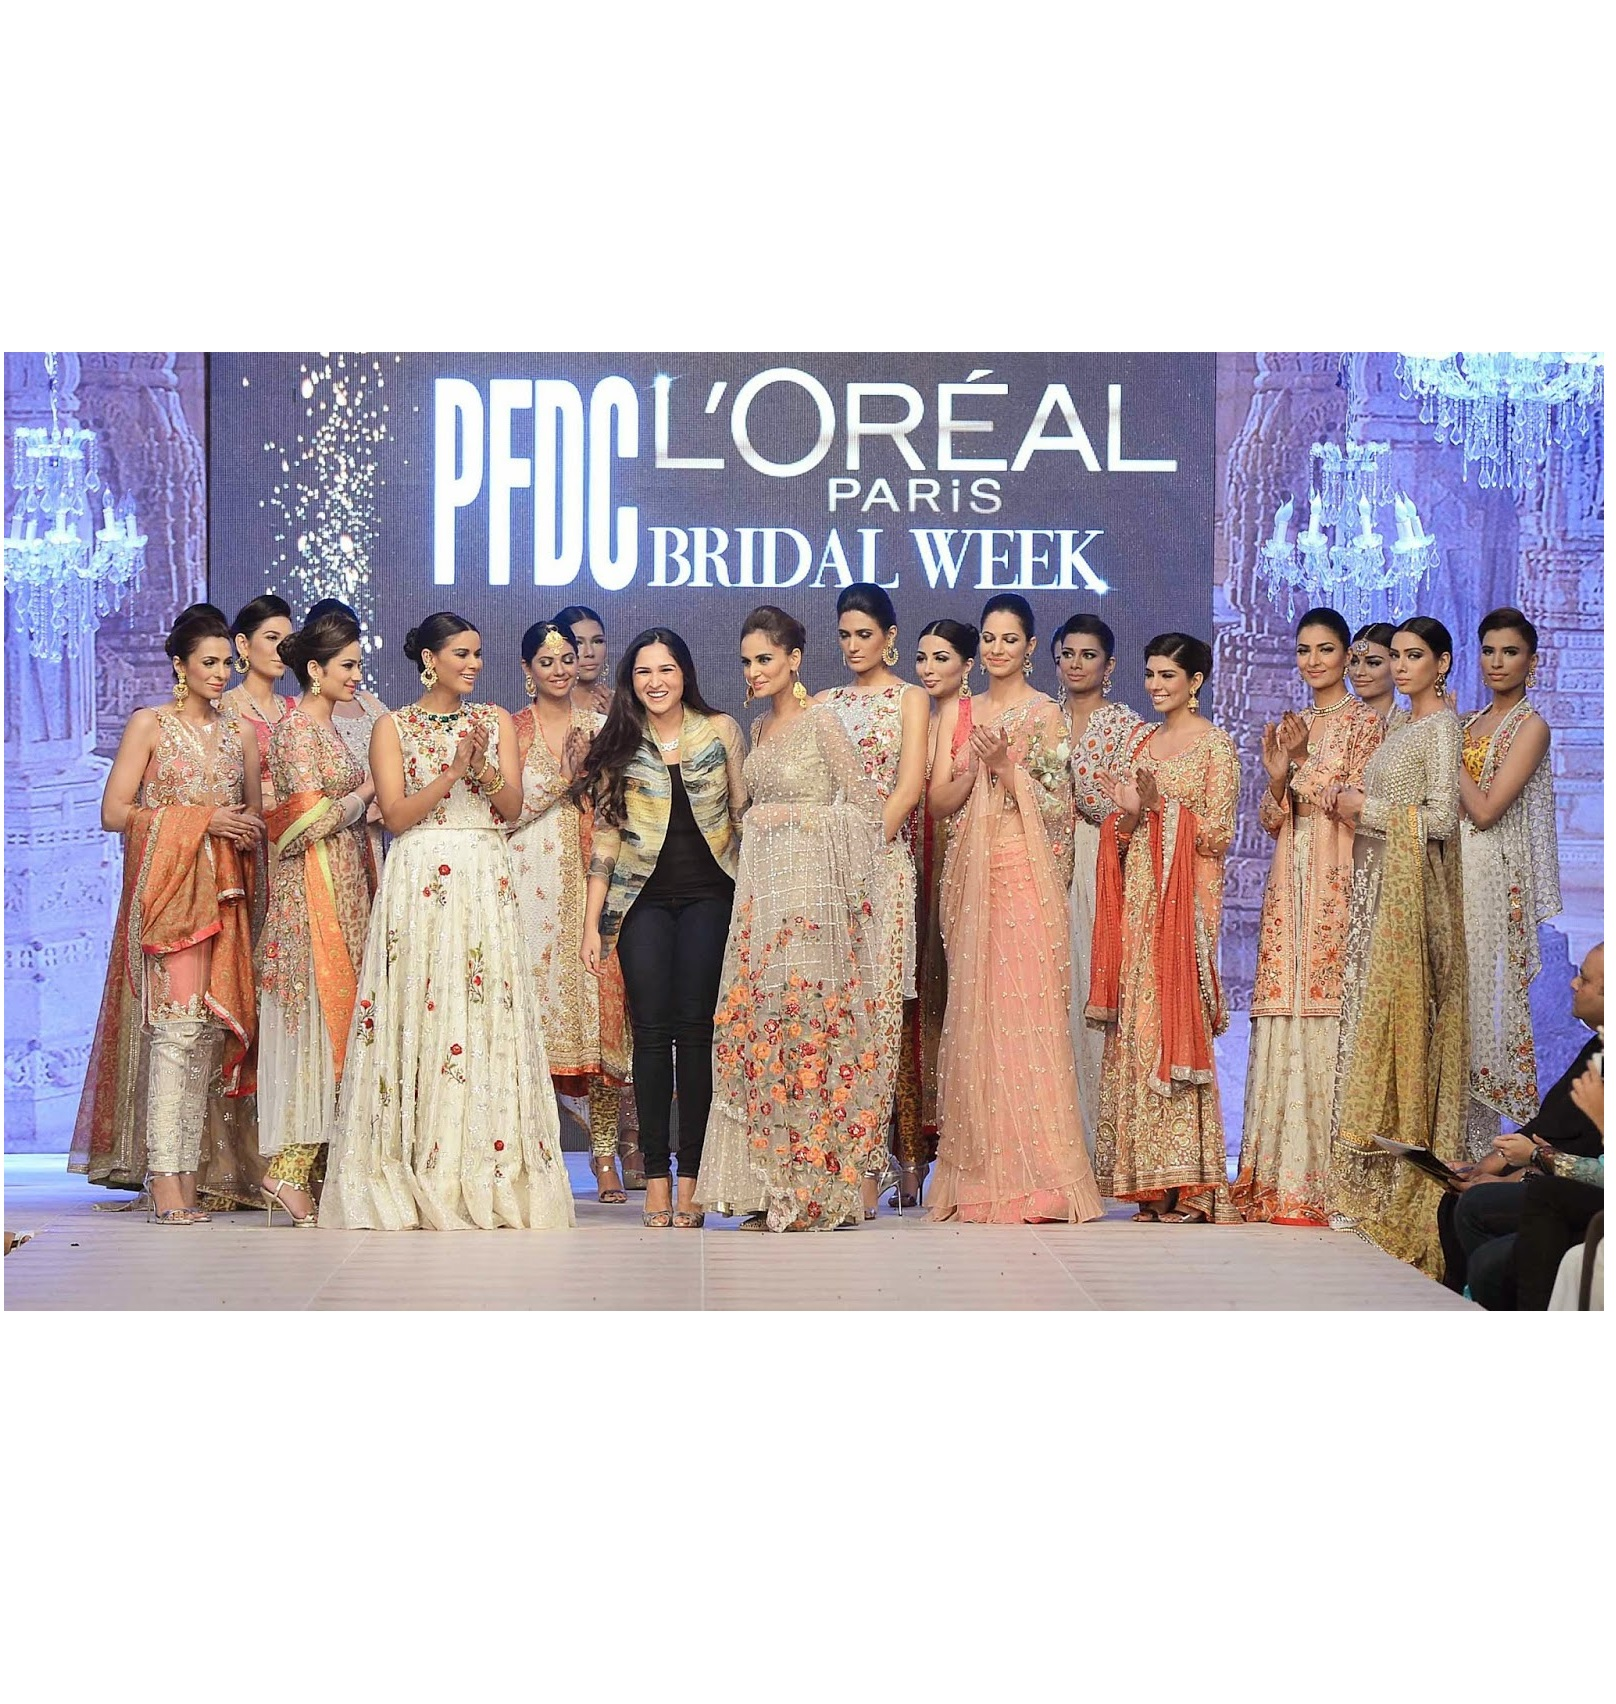 Warid Sponsors 4th PFDC L'Oreal Bridal Week 2014